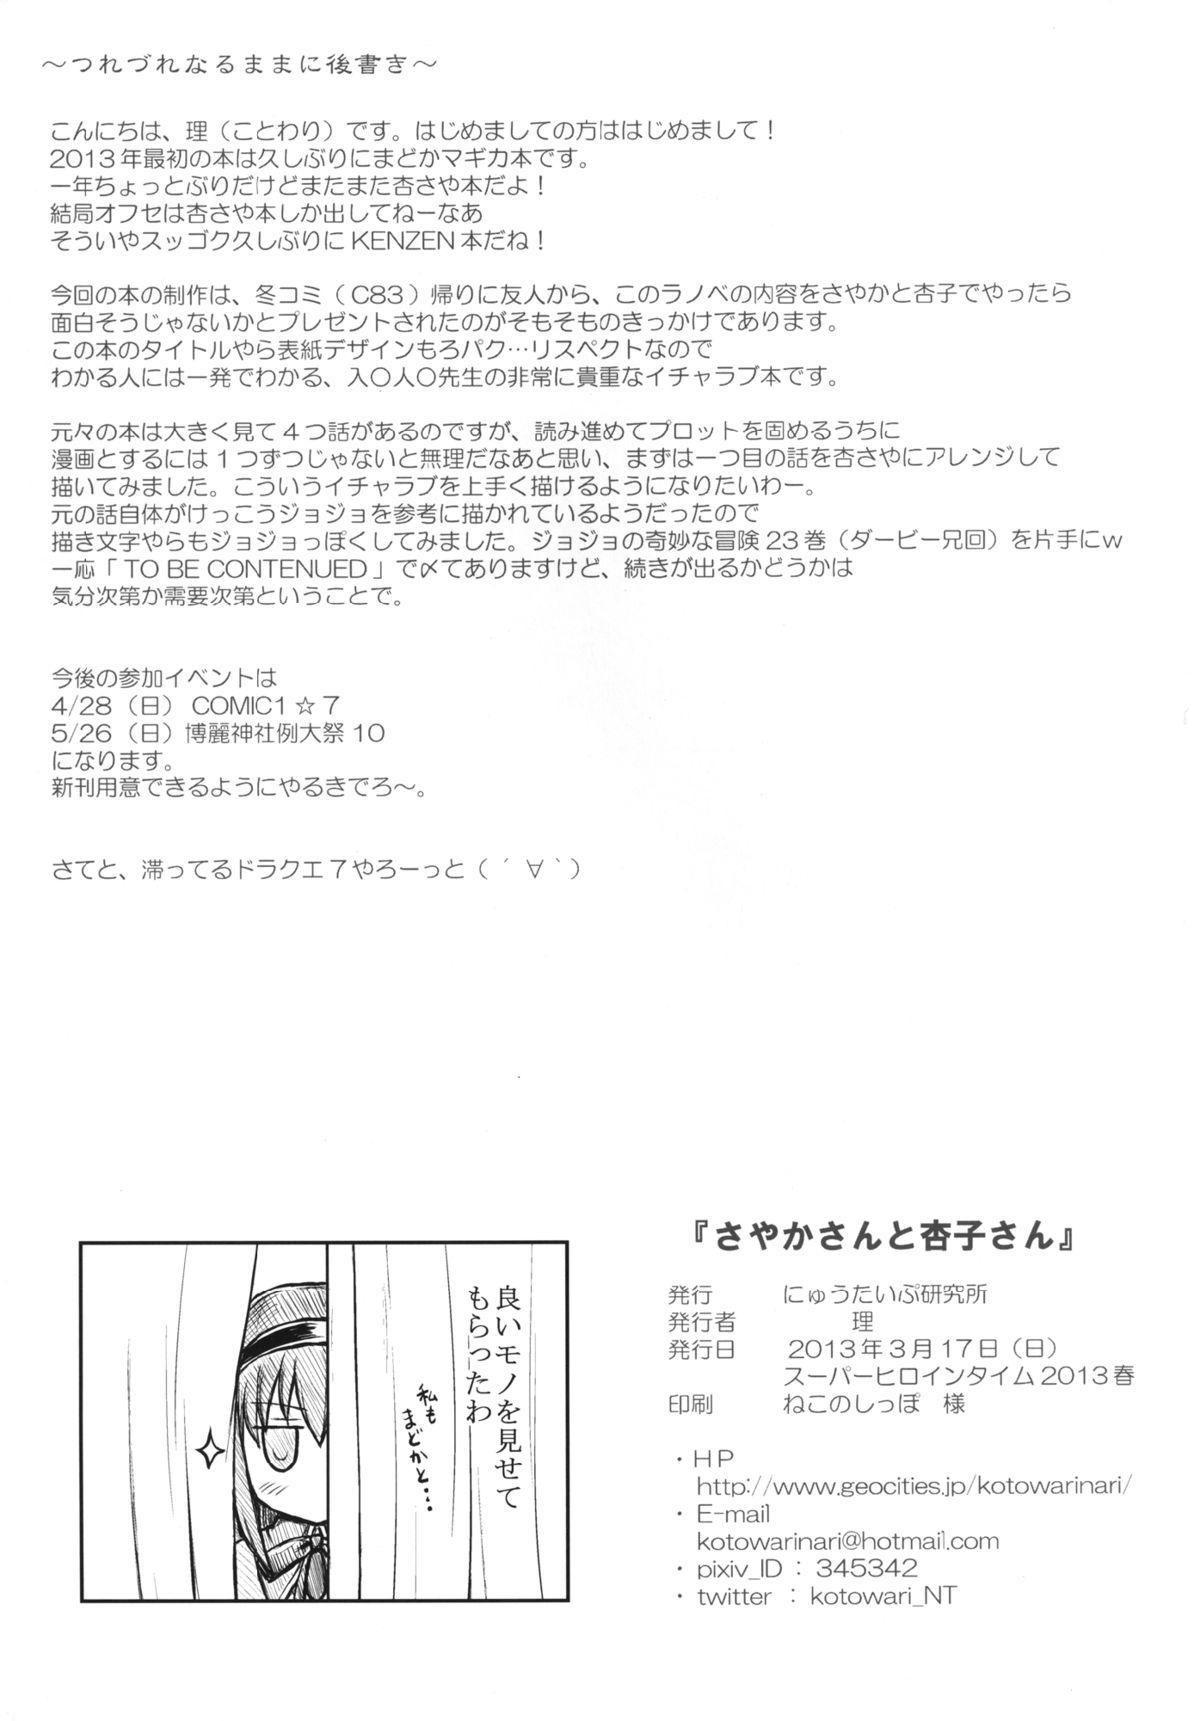 (SHT2013 Haru) [Newtype Kenkyuujo (Kotowari)] Sayaka-san to Kyouko-san (Puella Magi Madoka Magica) 29